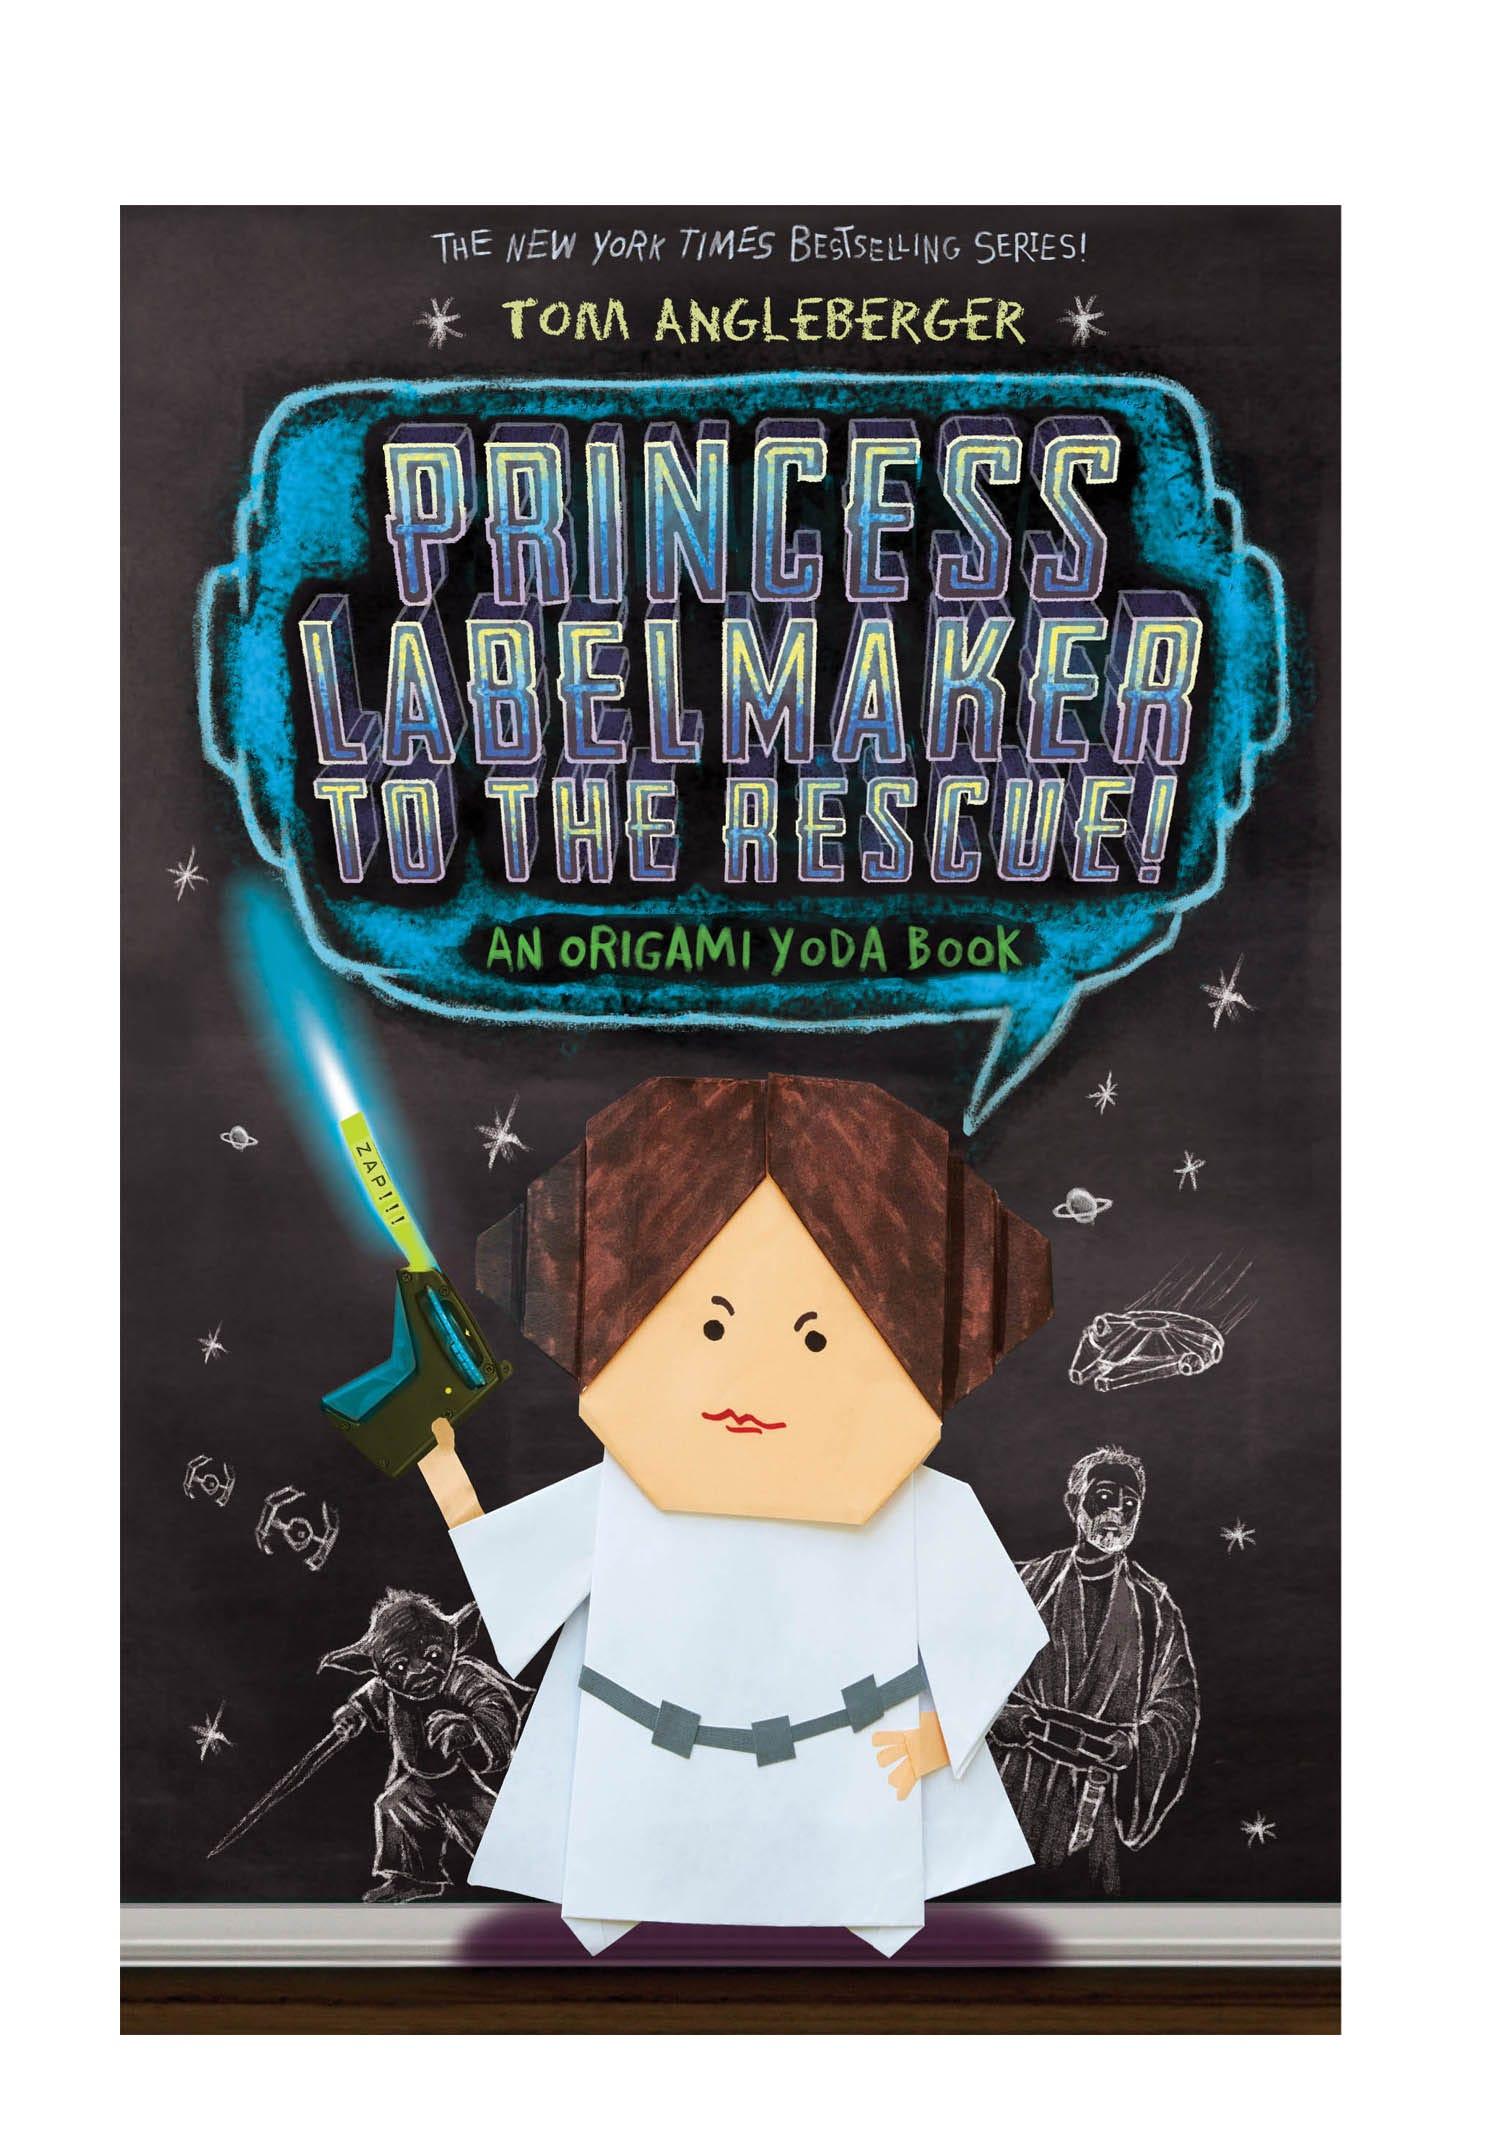 Origami Yoda Series Princess Labelmaker To The Rescue